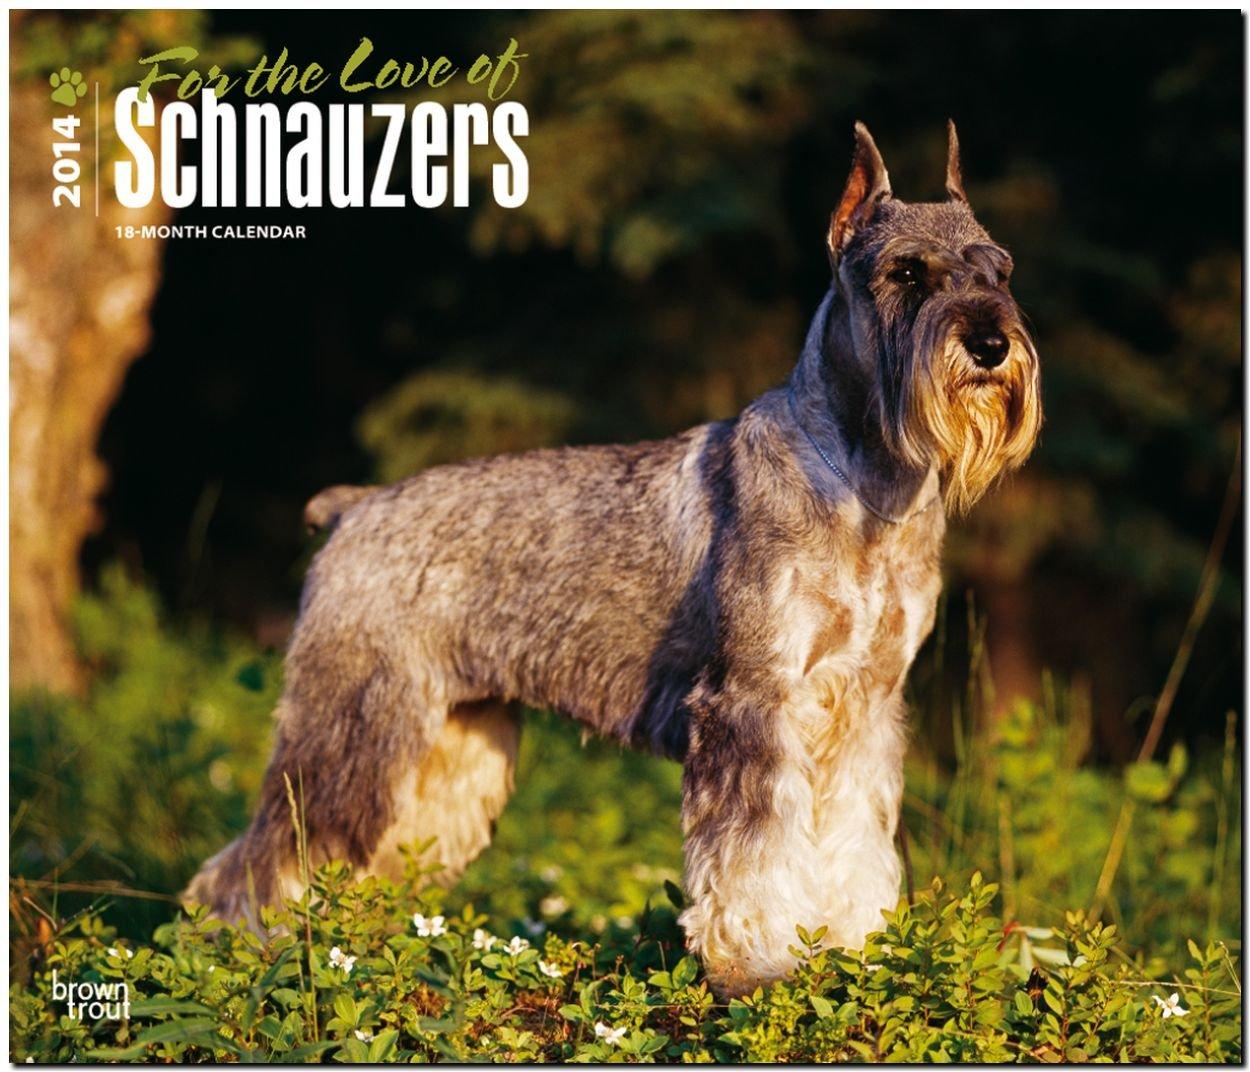 schnauzers-for-the-love-of-2014-schnauzer-original-browntrout-kalender-deluxe-mehrsprachig-kalender